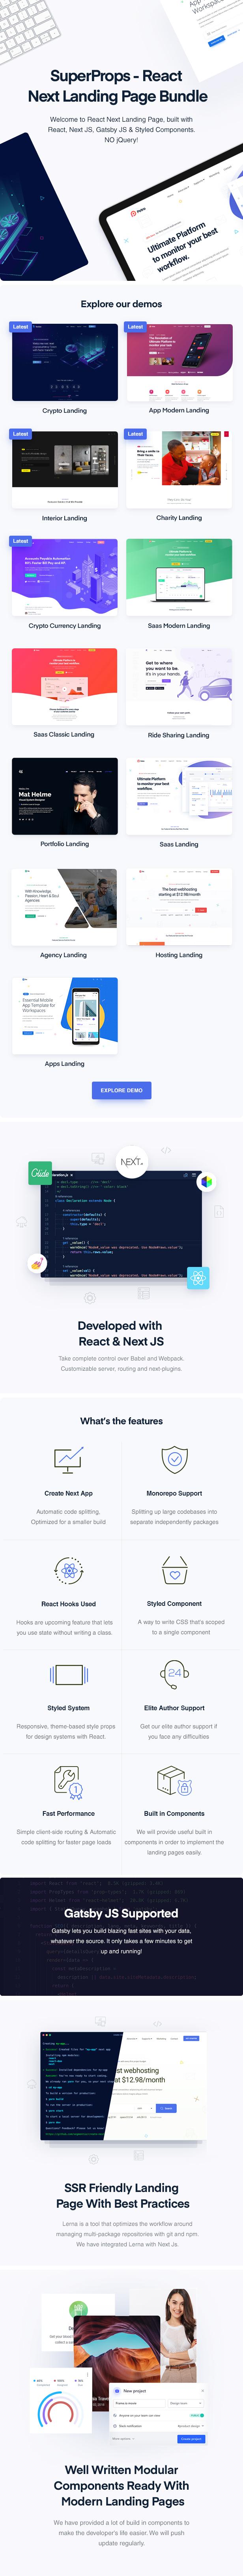 SuperProps - React Next Landing Page Templates - 1